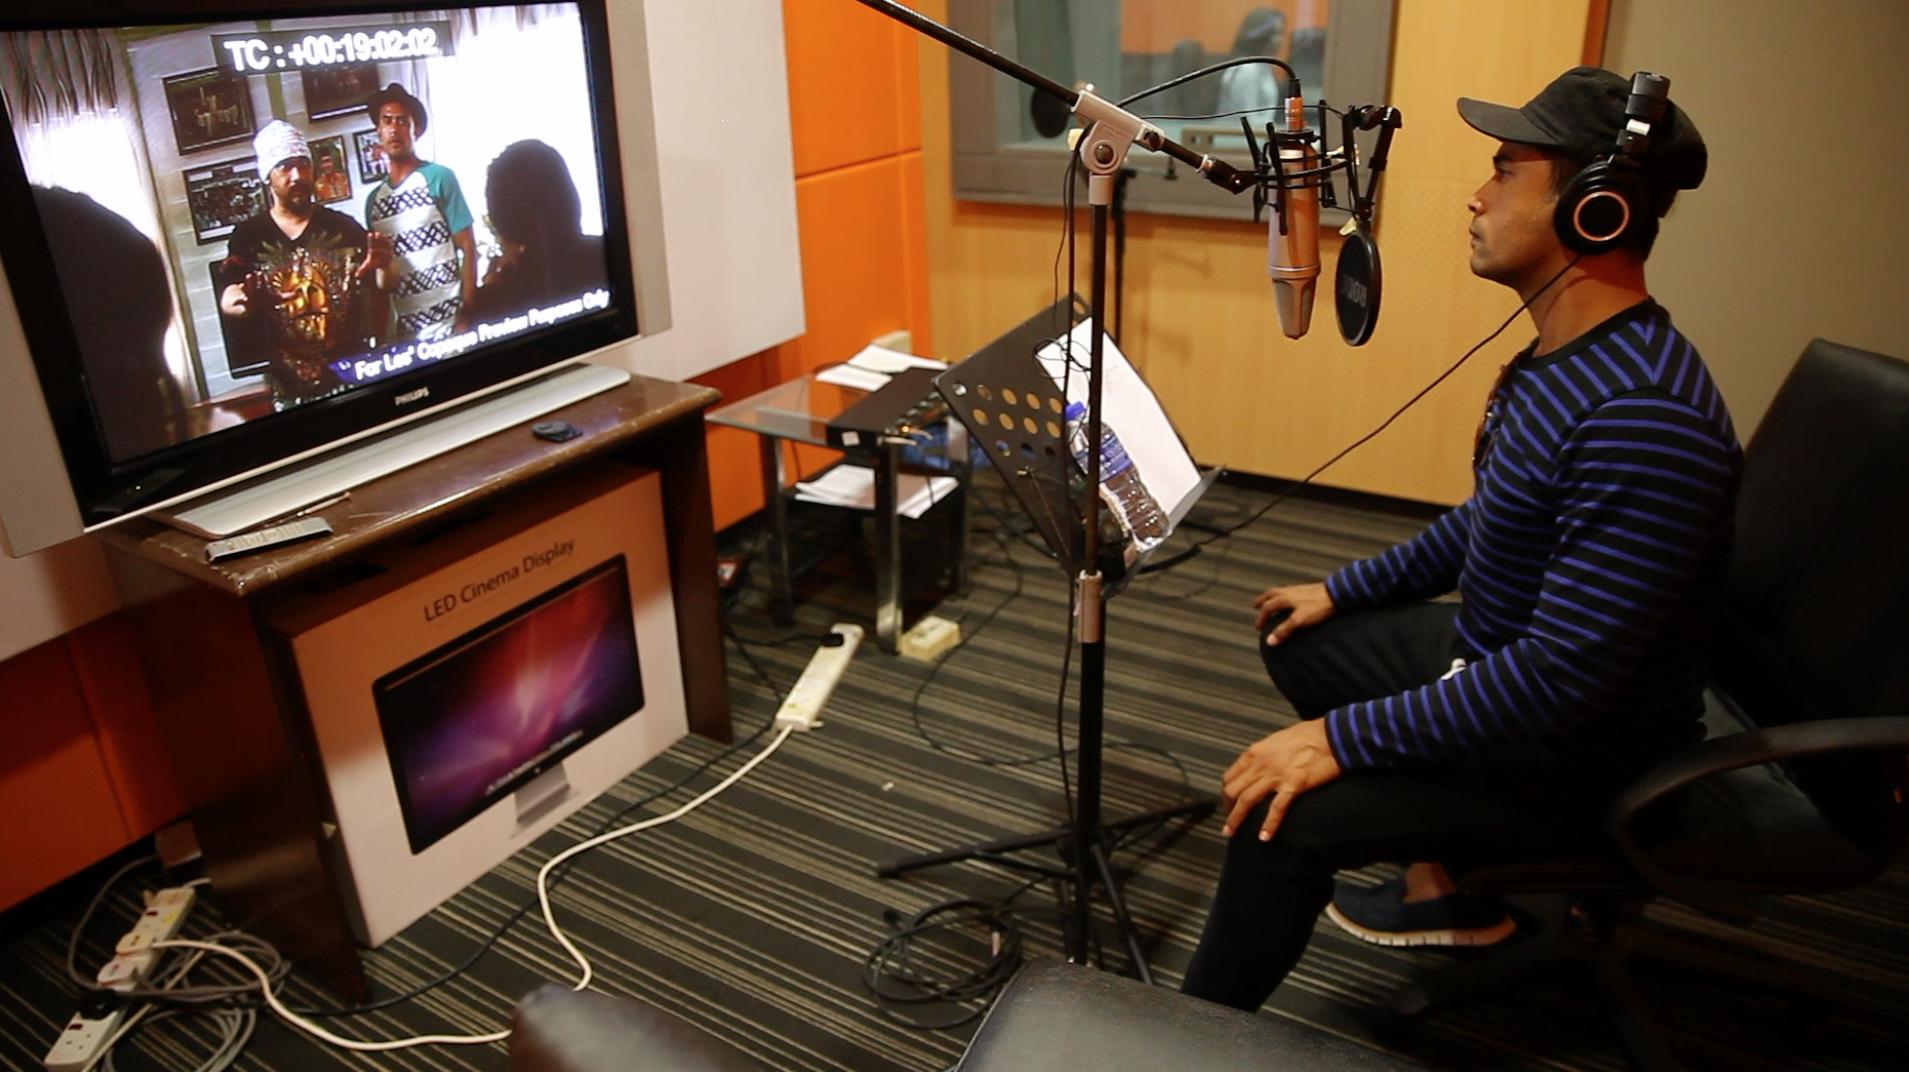 Proses 'voice over' oleh Remy Ishak yang membawa watak sebagai Bo